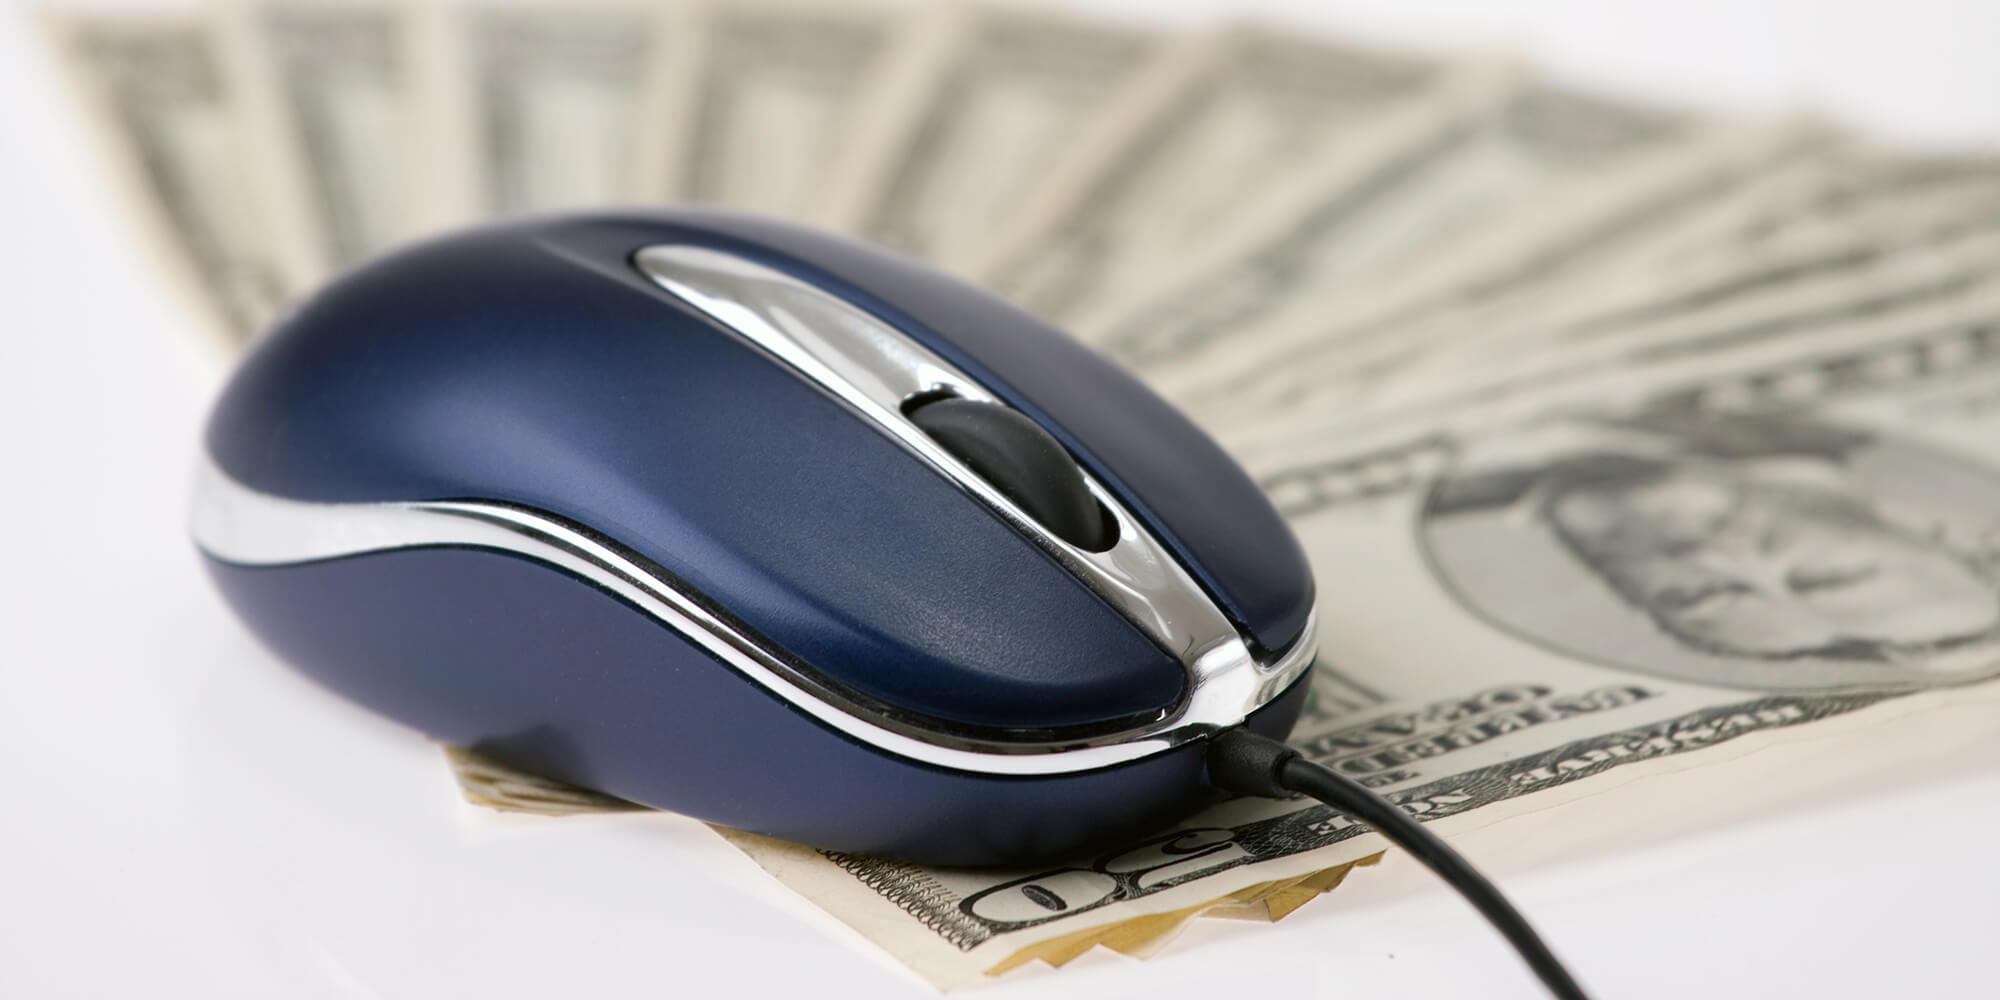 dot-click-promotion-sale-coupon-deal-on-click-domains